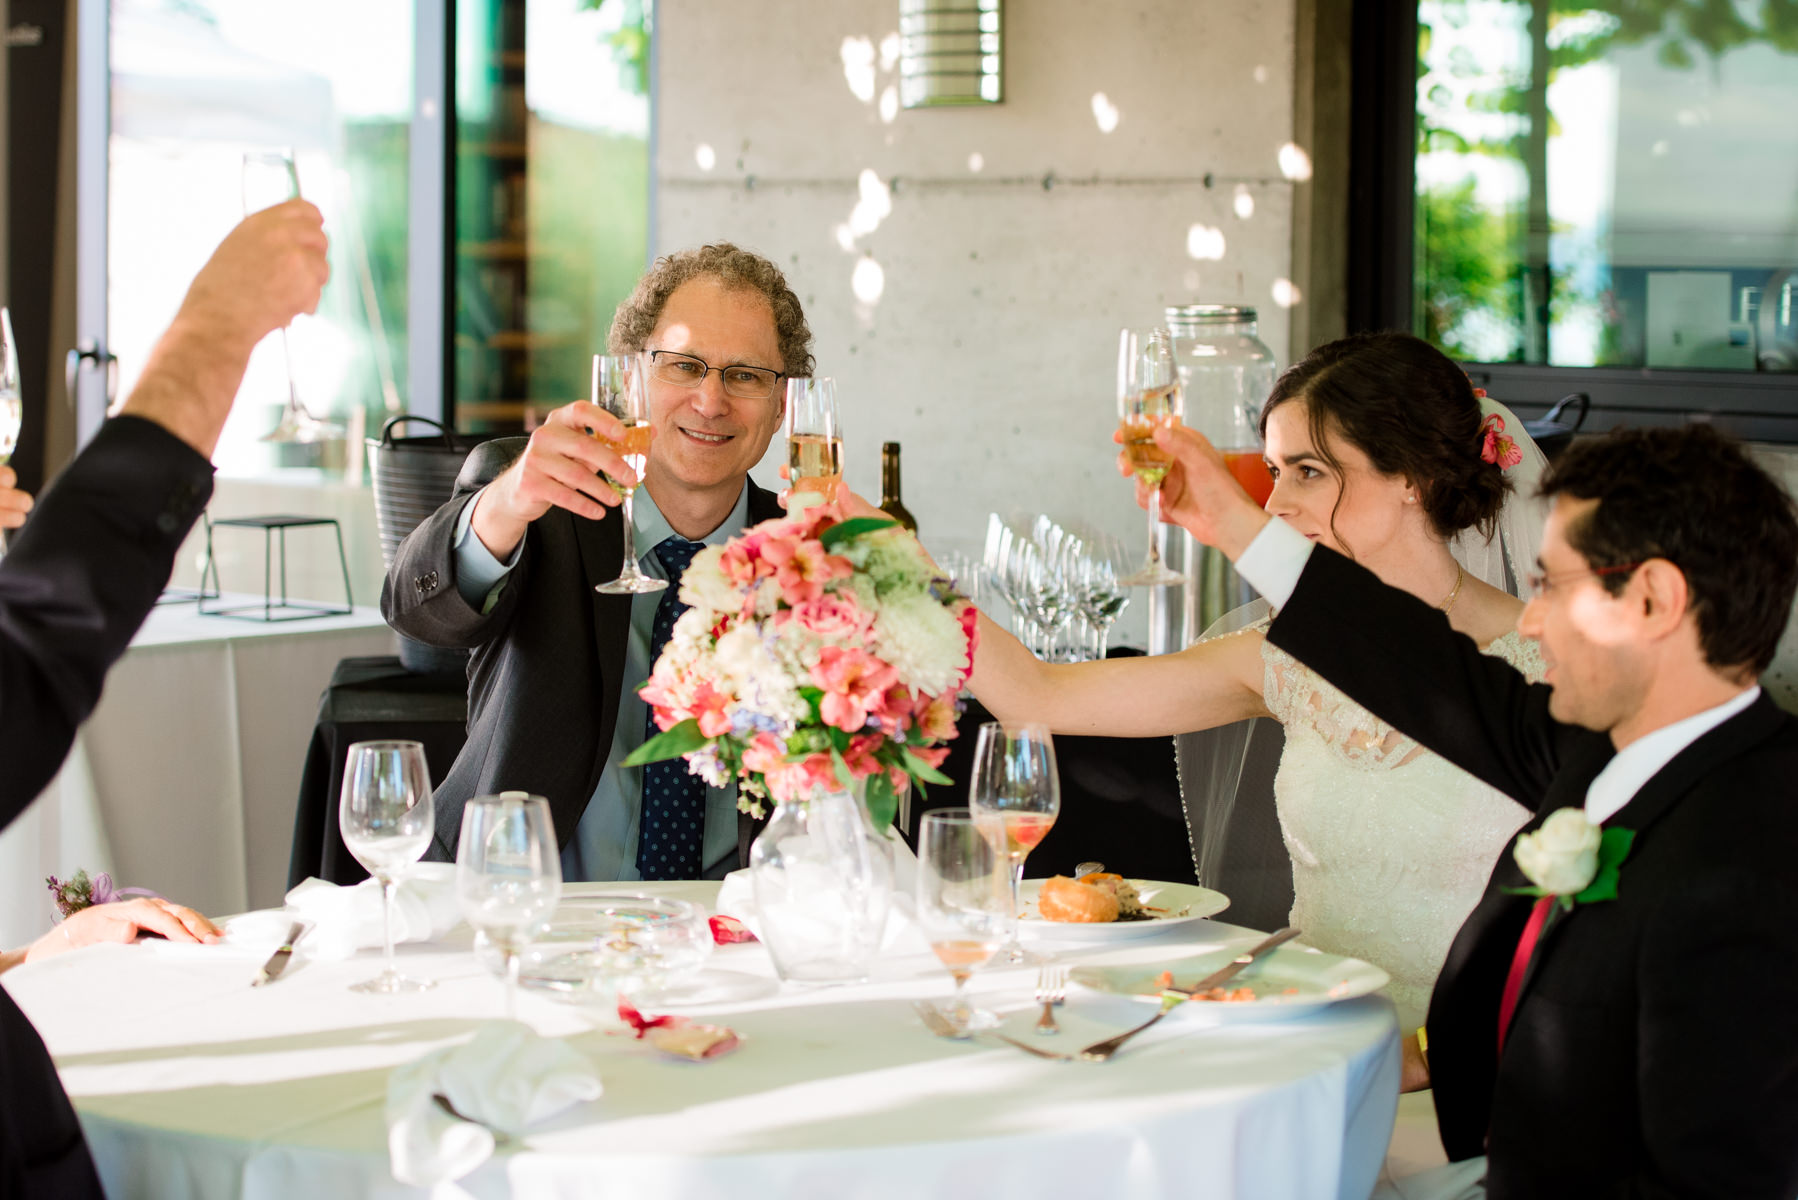 Andrew Tat - Documentary Wedding Photography - Kirkland, Washington - Emily & Cuauh - 32.JPG